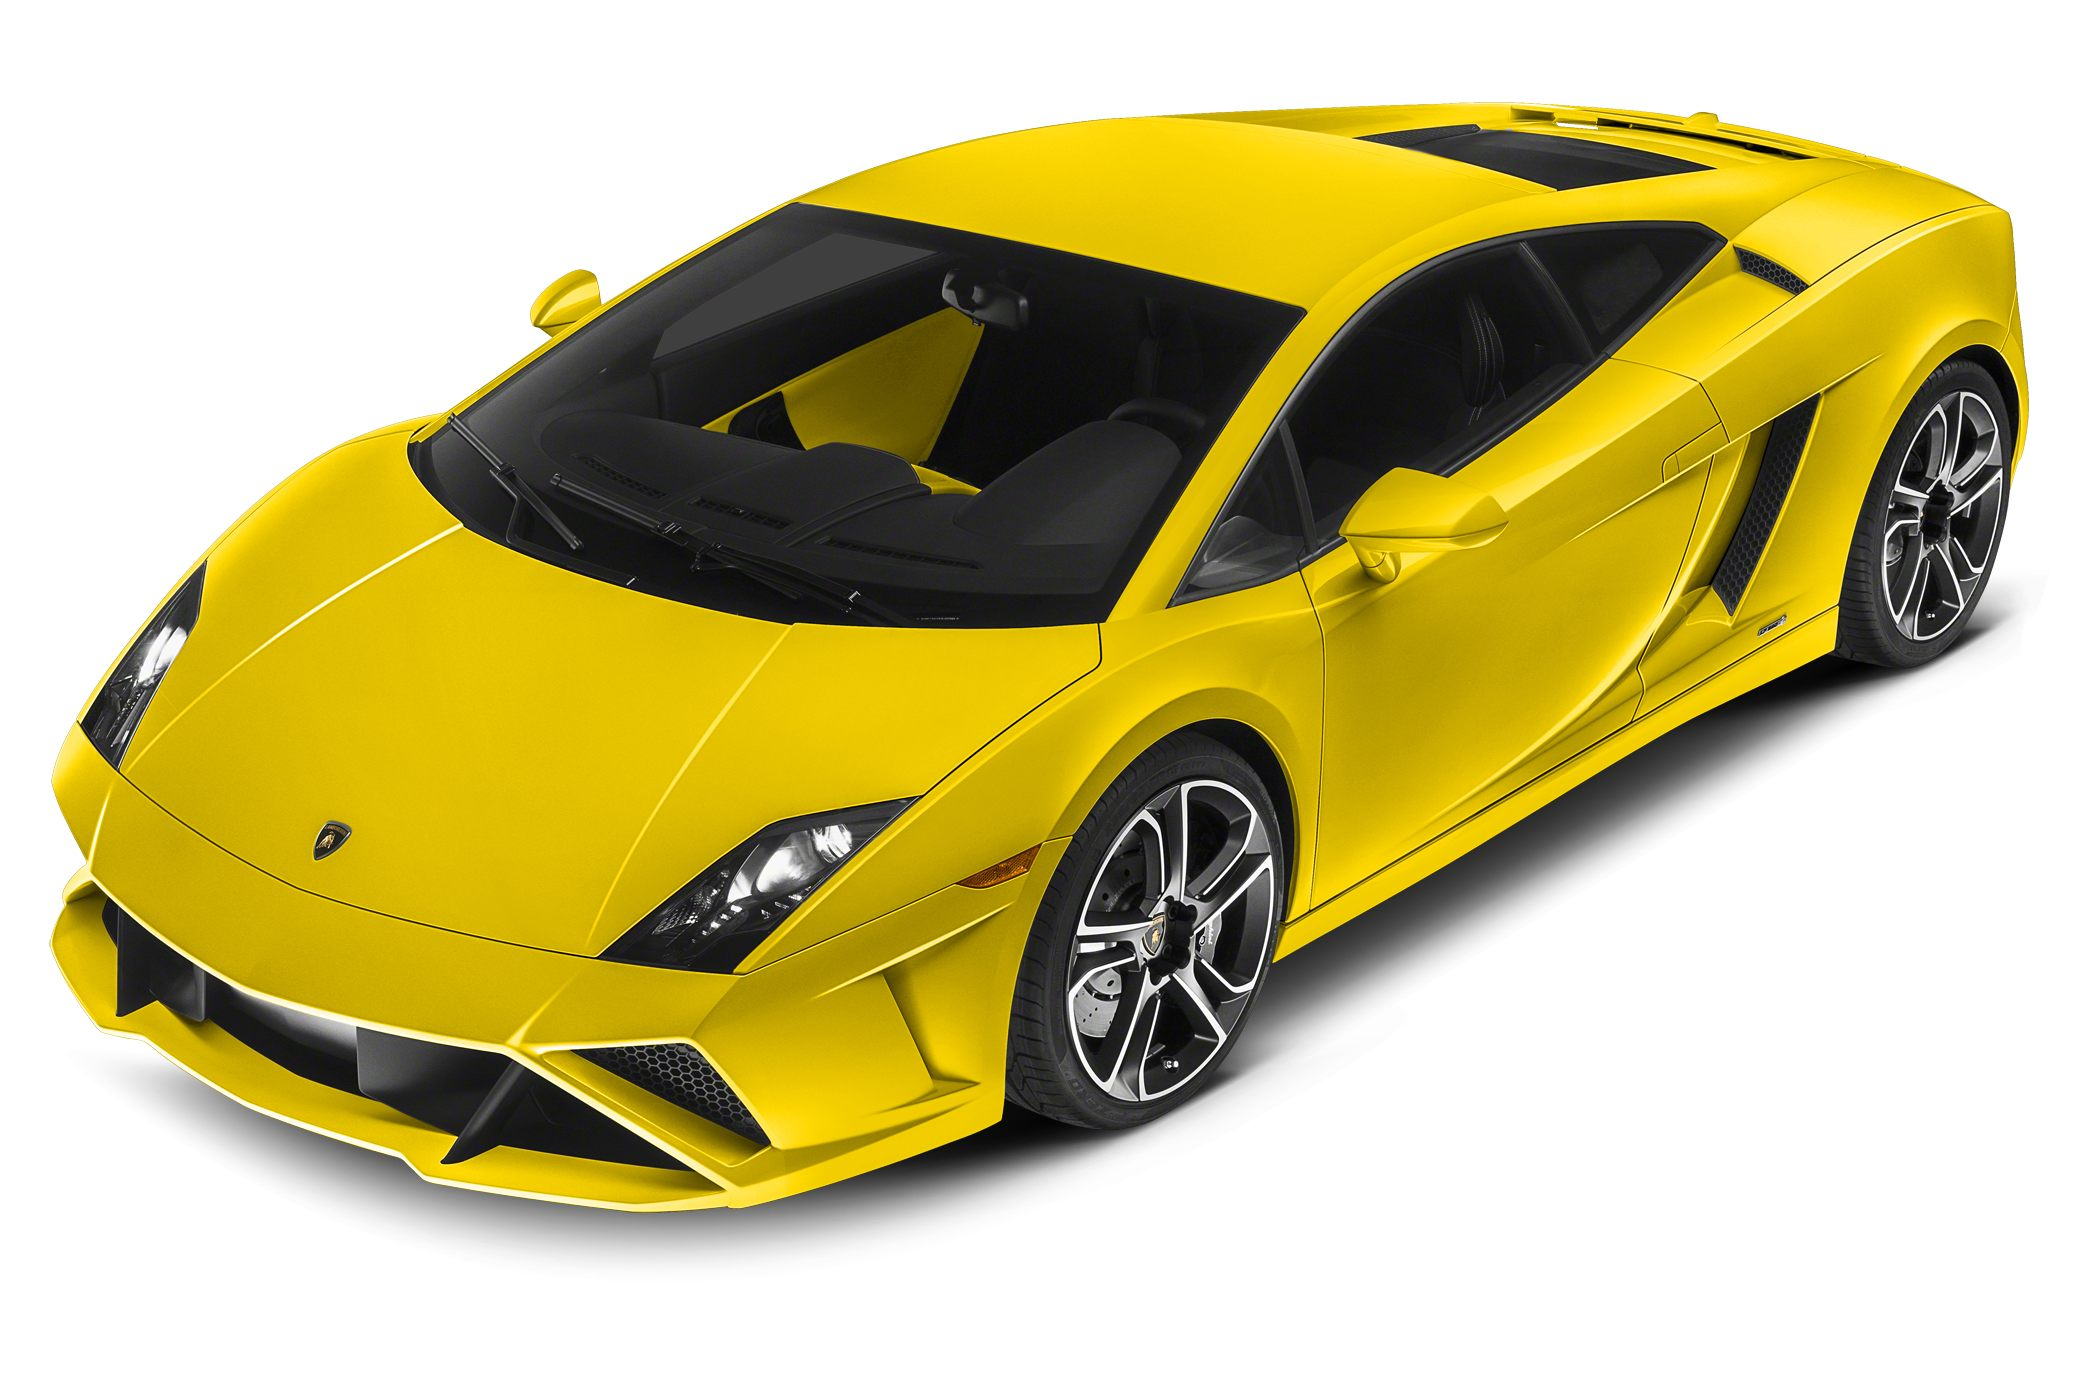 HQ Lamborghini Gallardo Wallpapers   File 240.28Kb